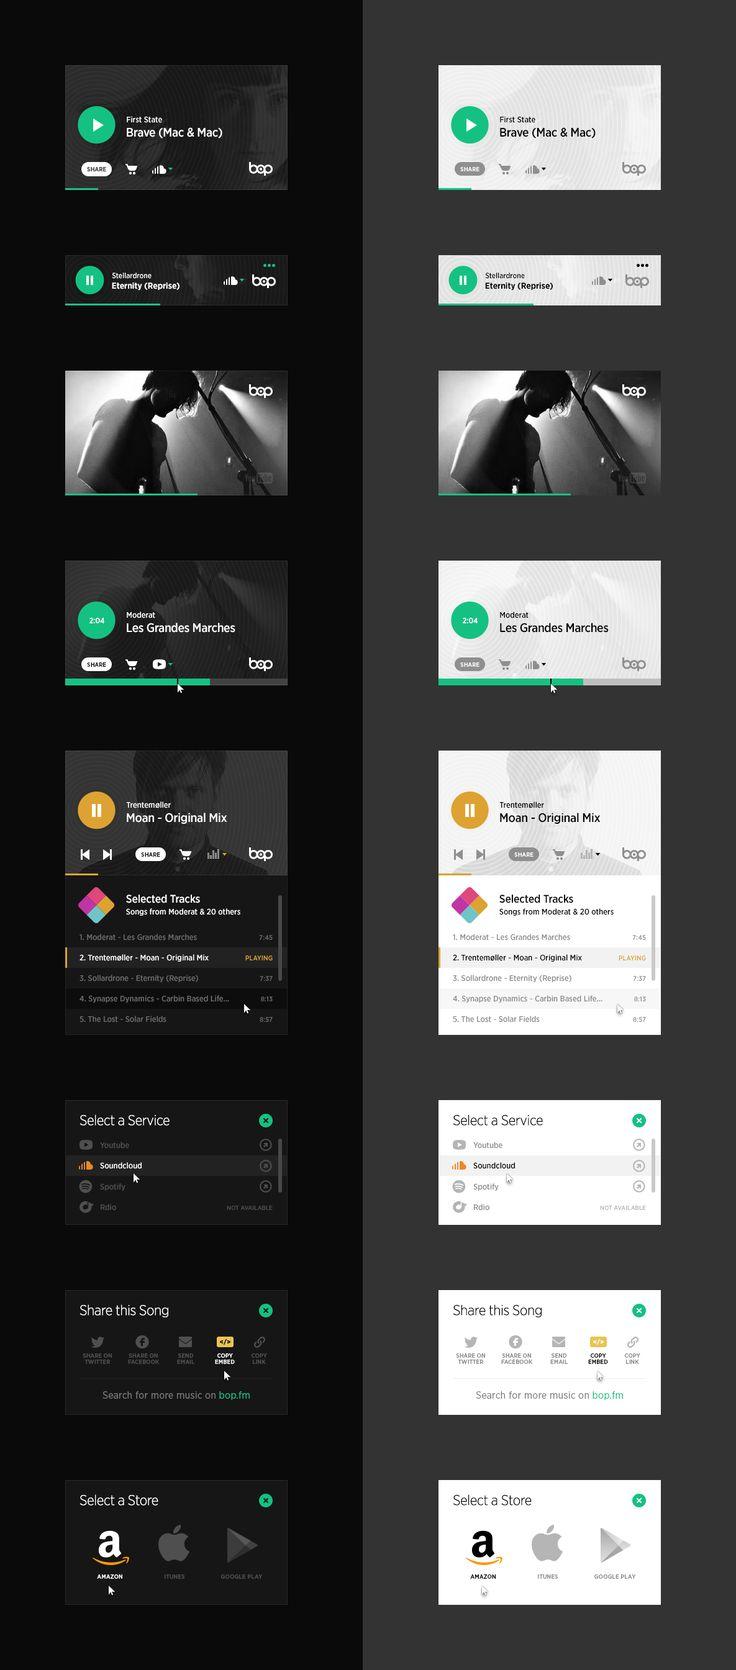 Dribbble social app ui design jpg by ramotion - Dribbble Bop_webplayer Fullpixels Png By Pivotal